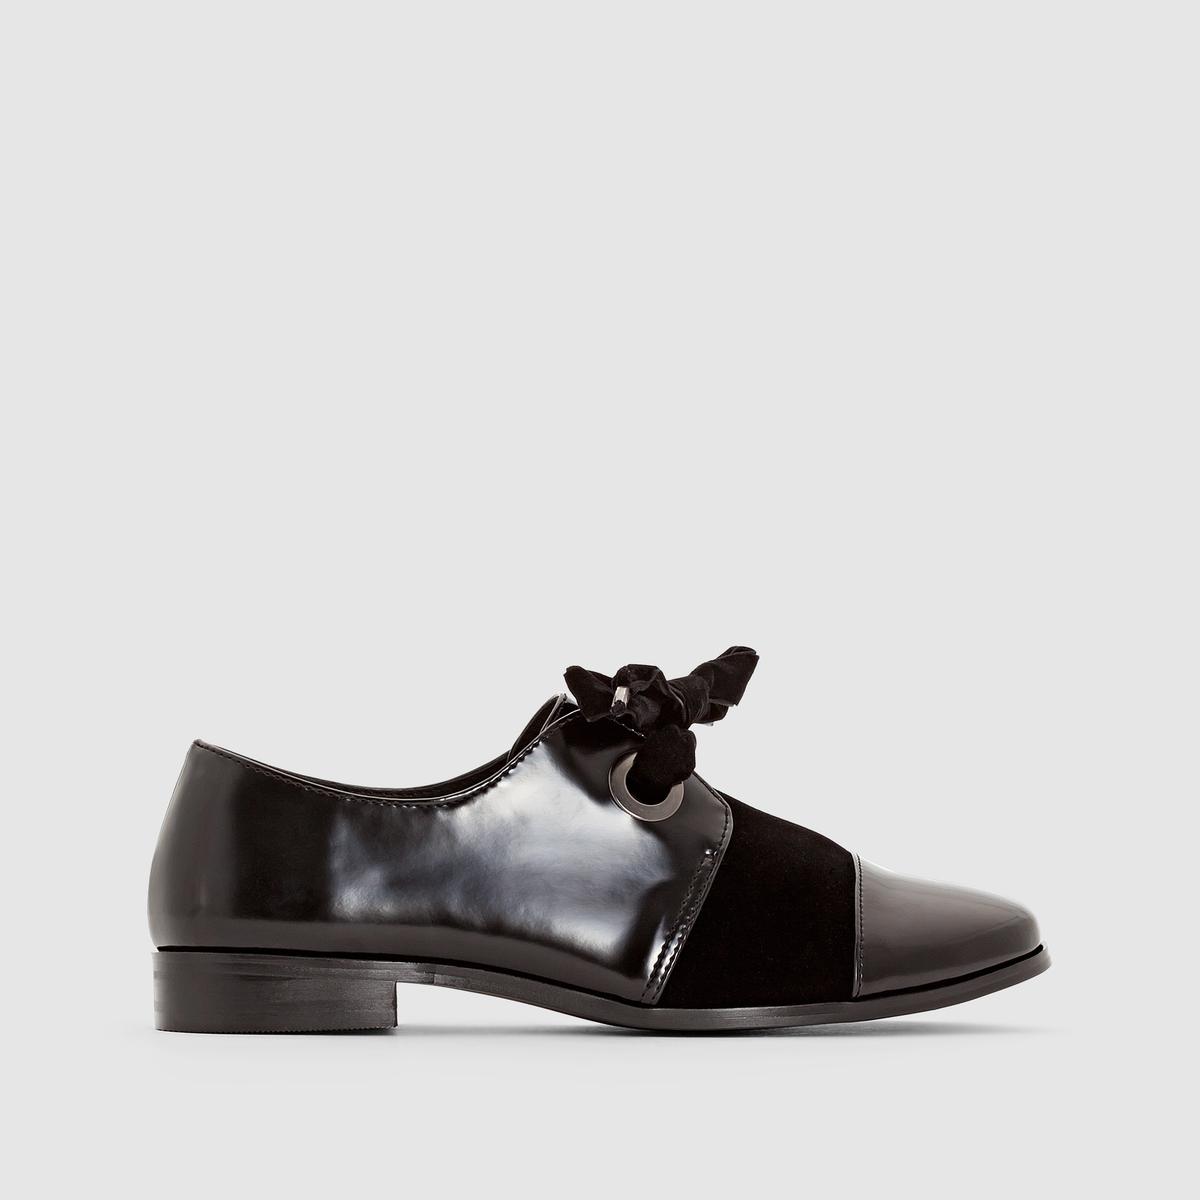 Ботинки-дерби на шнуровке